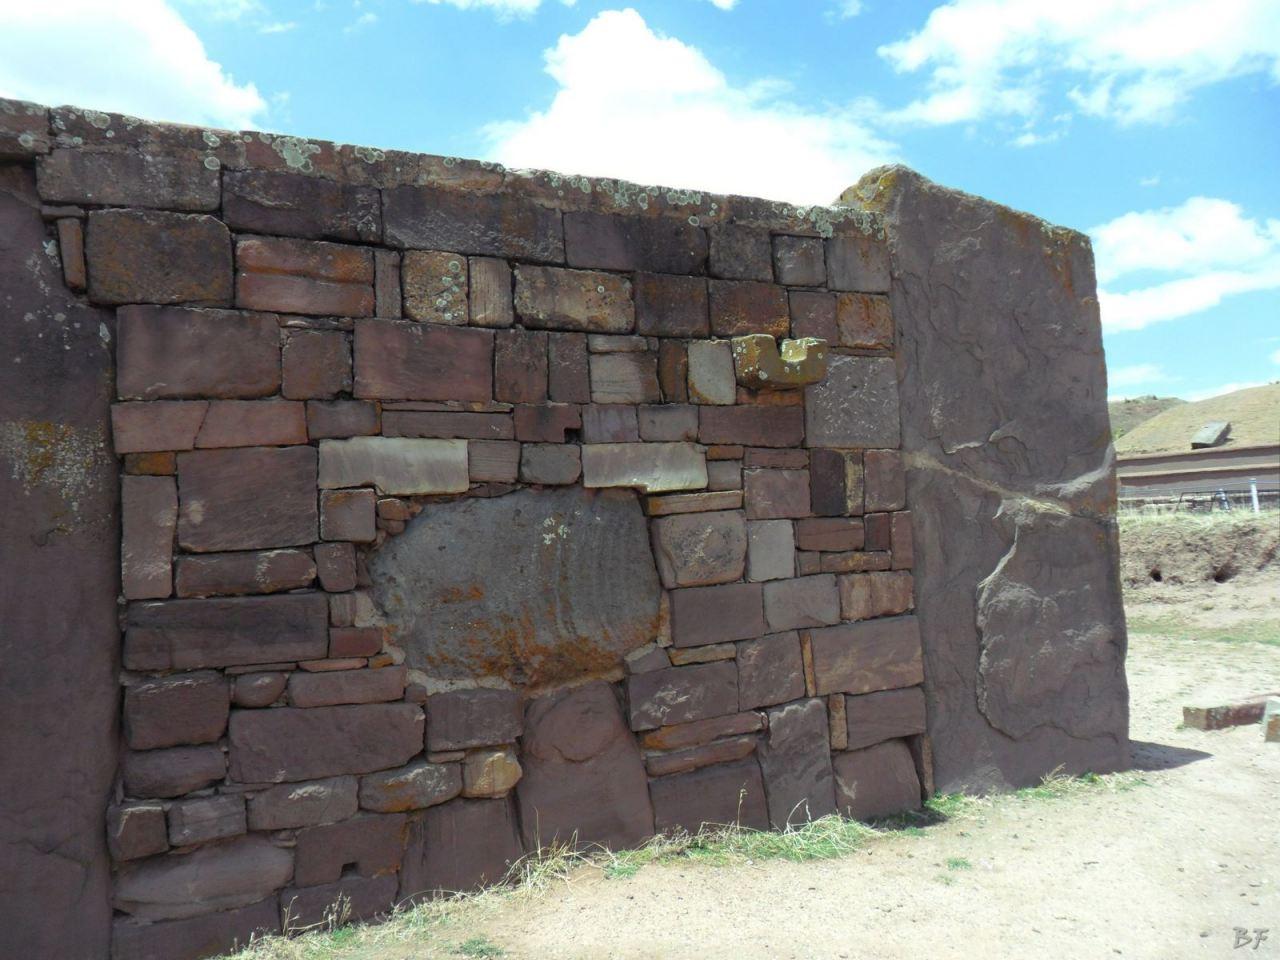 Sito-Megalitico-Piramide-Akapana-Kalasasaya-Menhir-Tiahuanaco-Bolivia-59